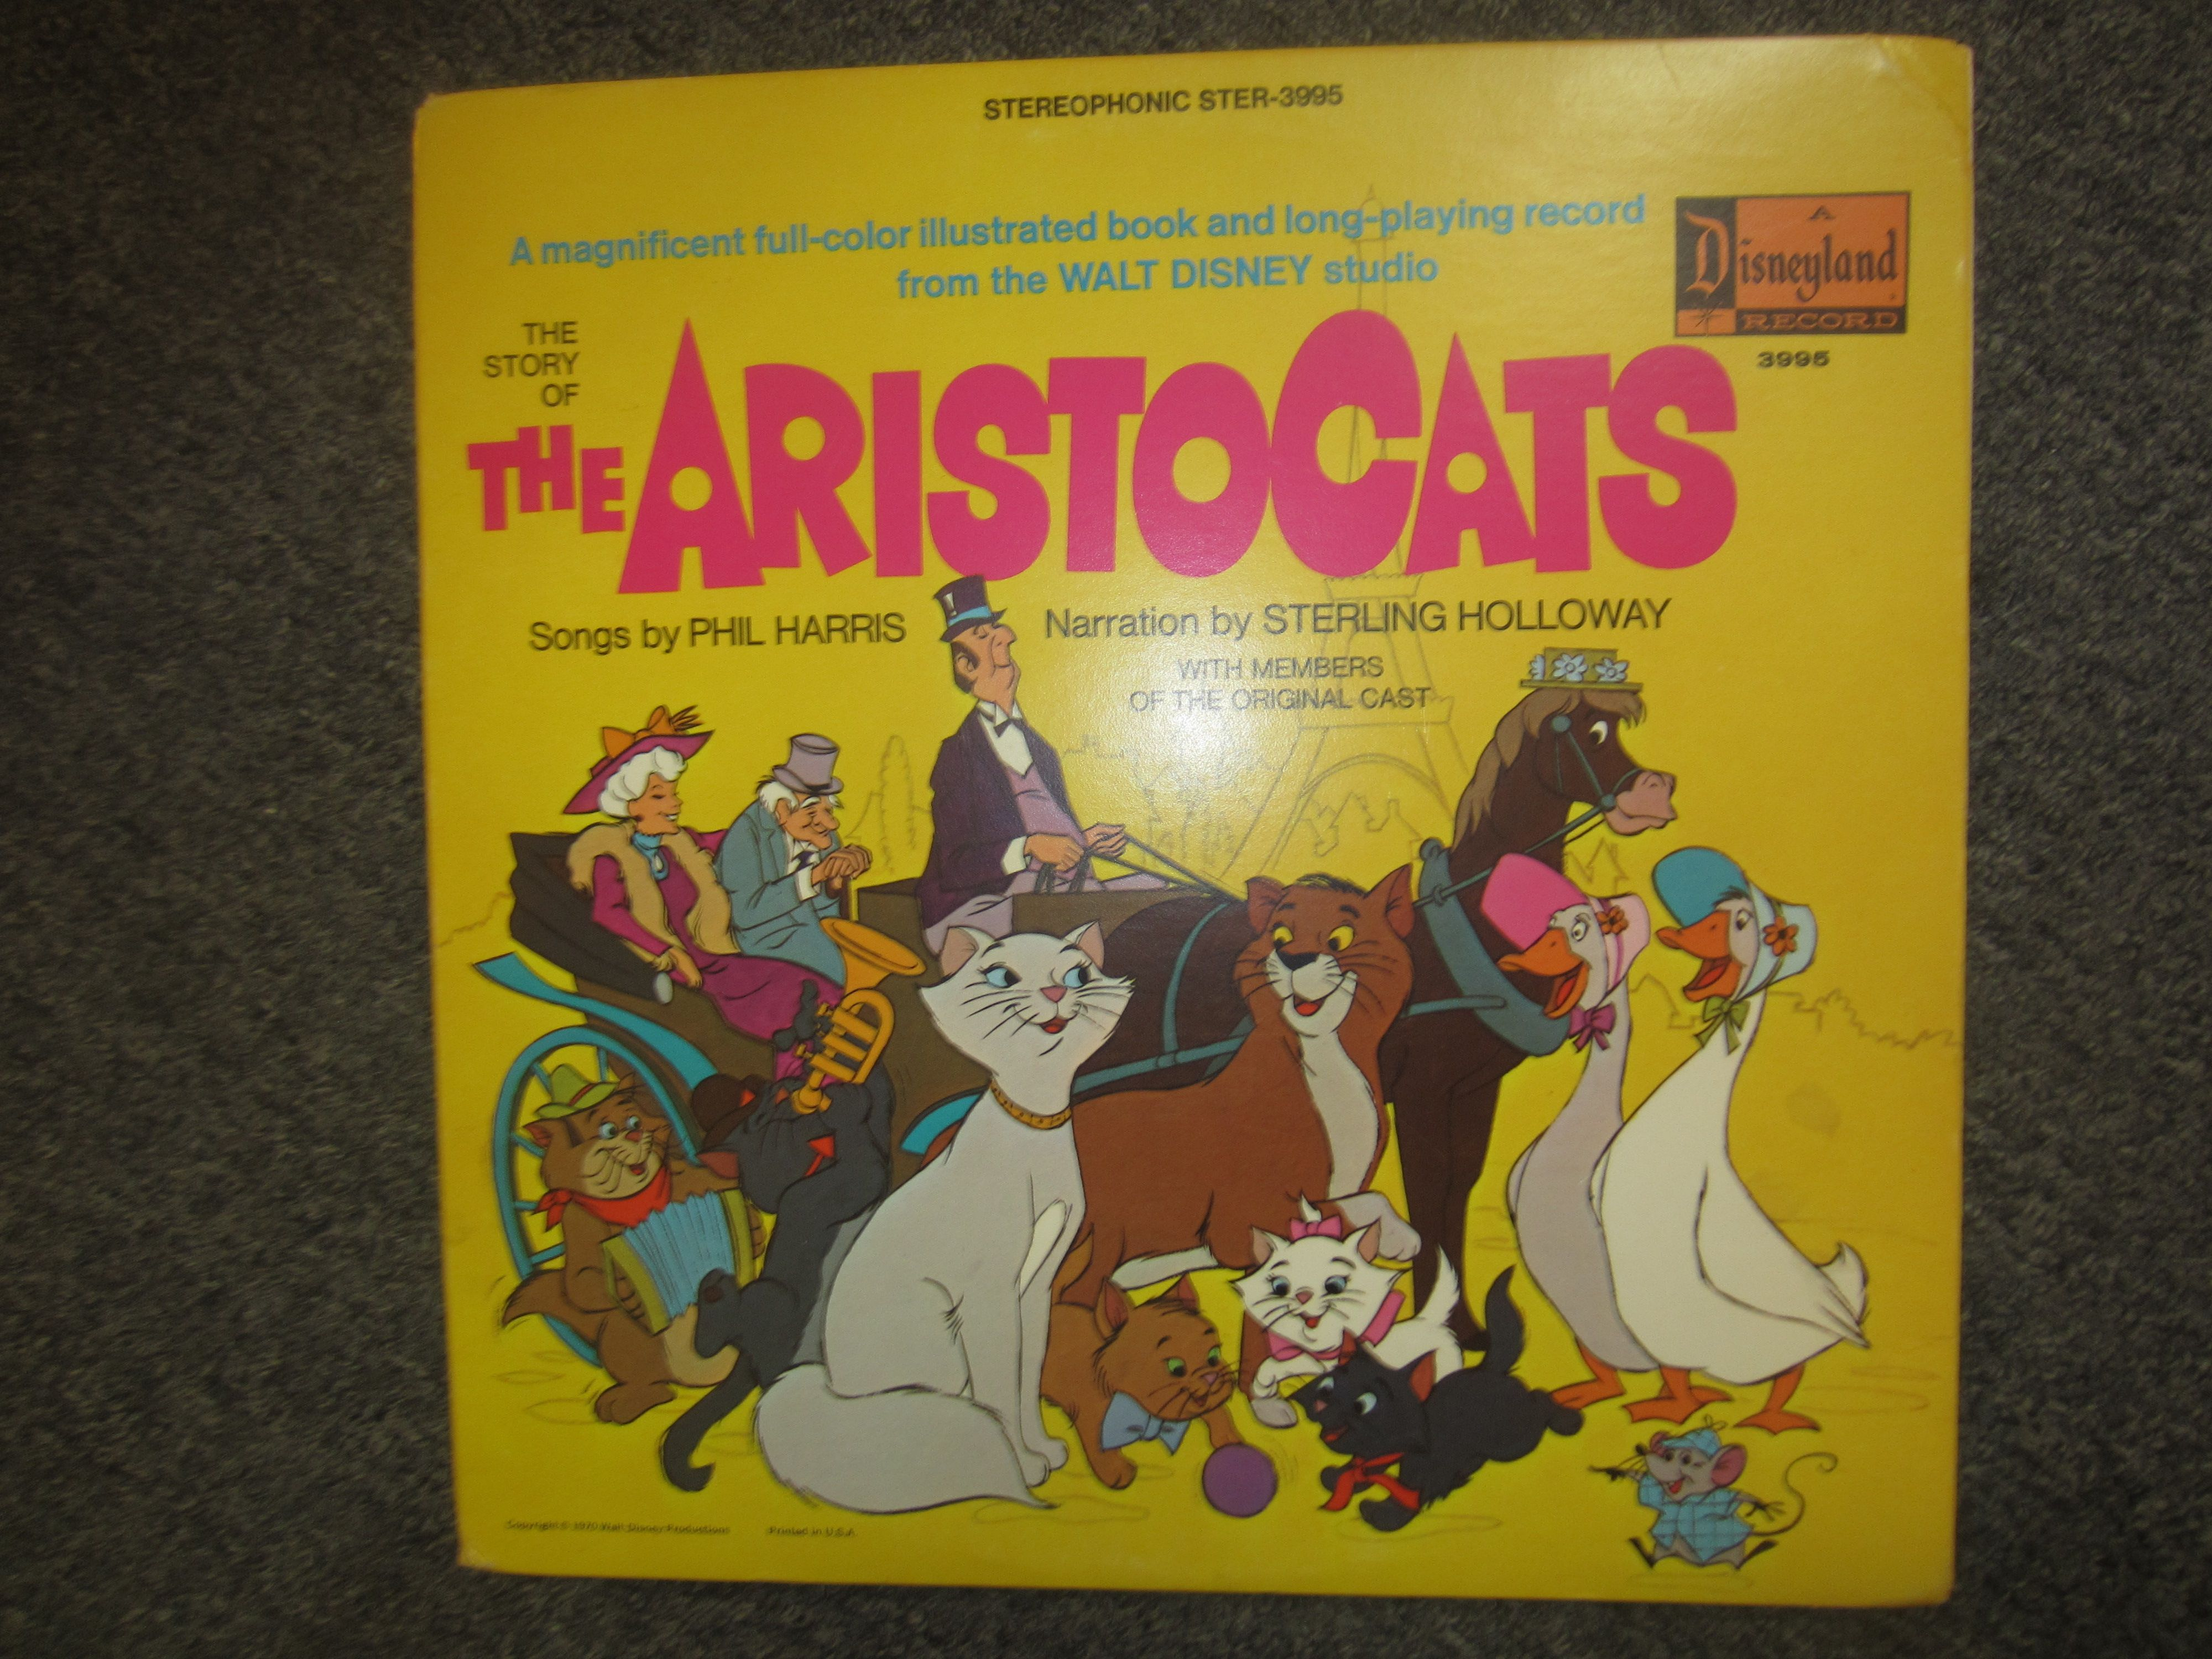 The Aristocats Purr Ty Pussycat Songs Vinyl Lp Record Album Happy Time Label Kookykitsch Com Vinyl Record Album Album Covers Walt Disney Studios